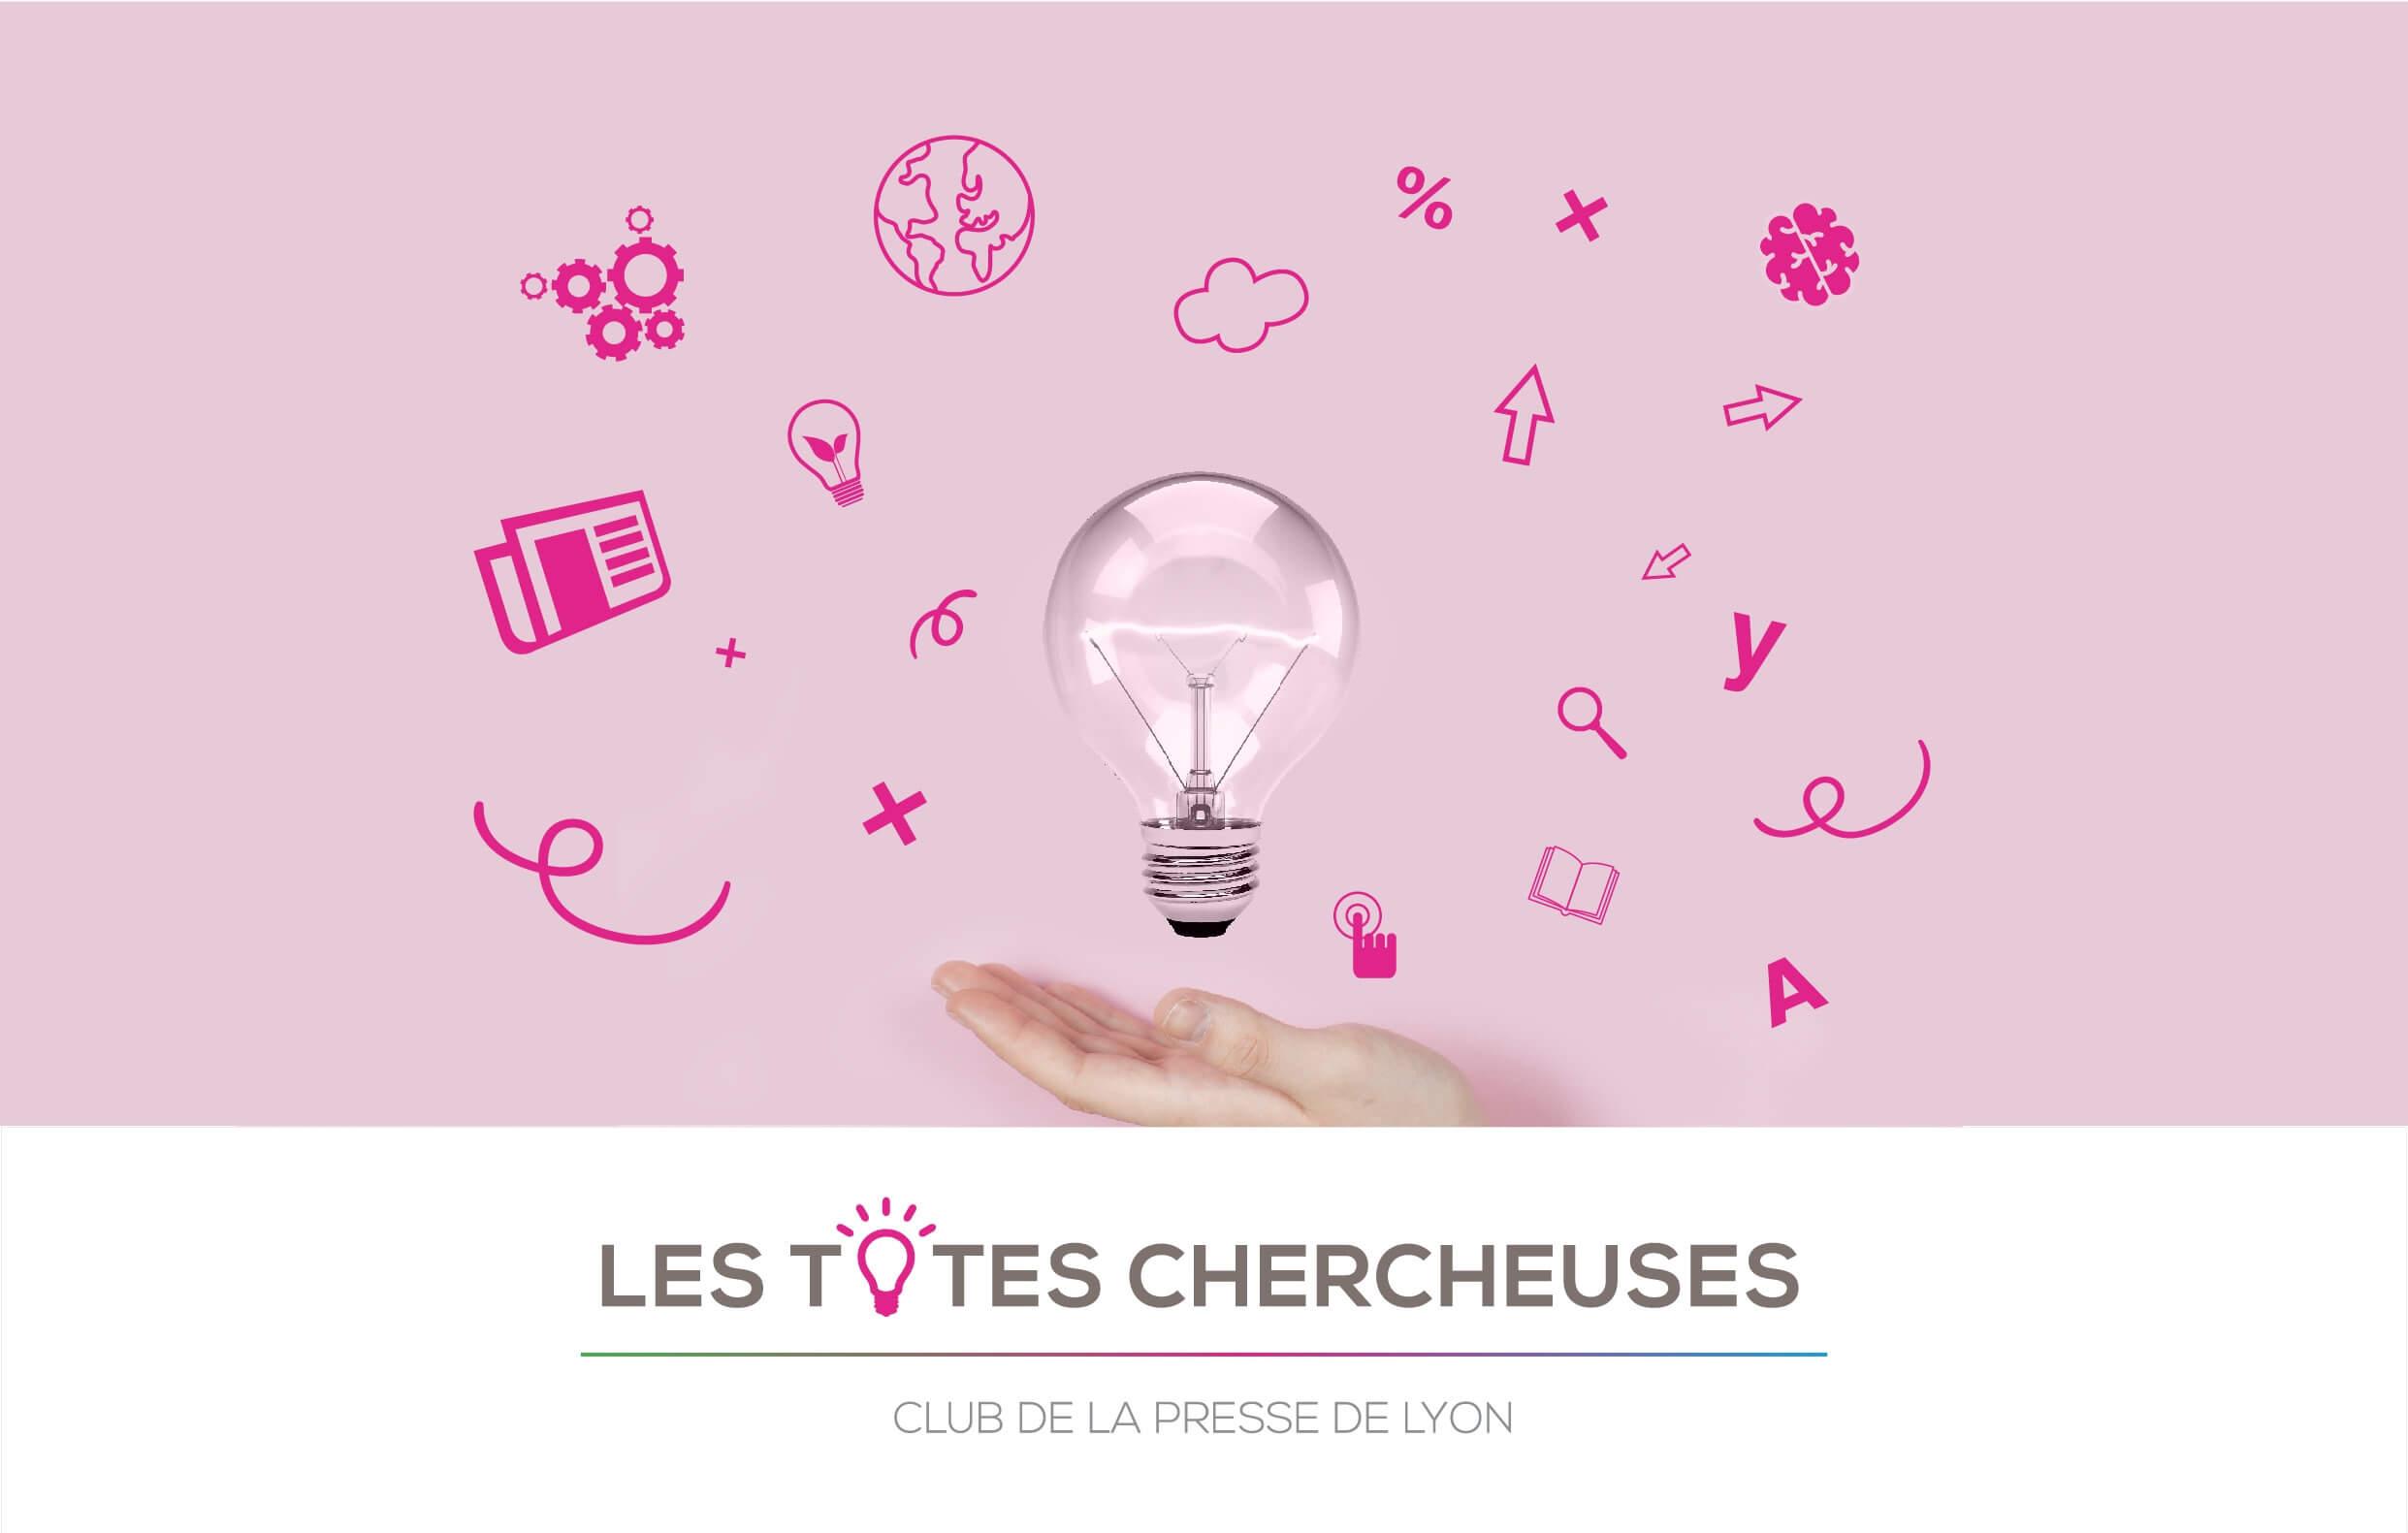 TETES CHERCHEUSES